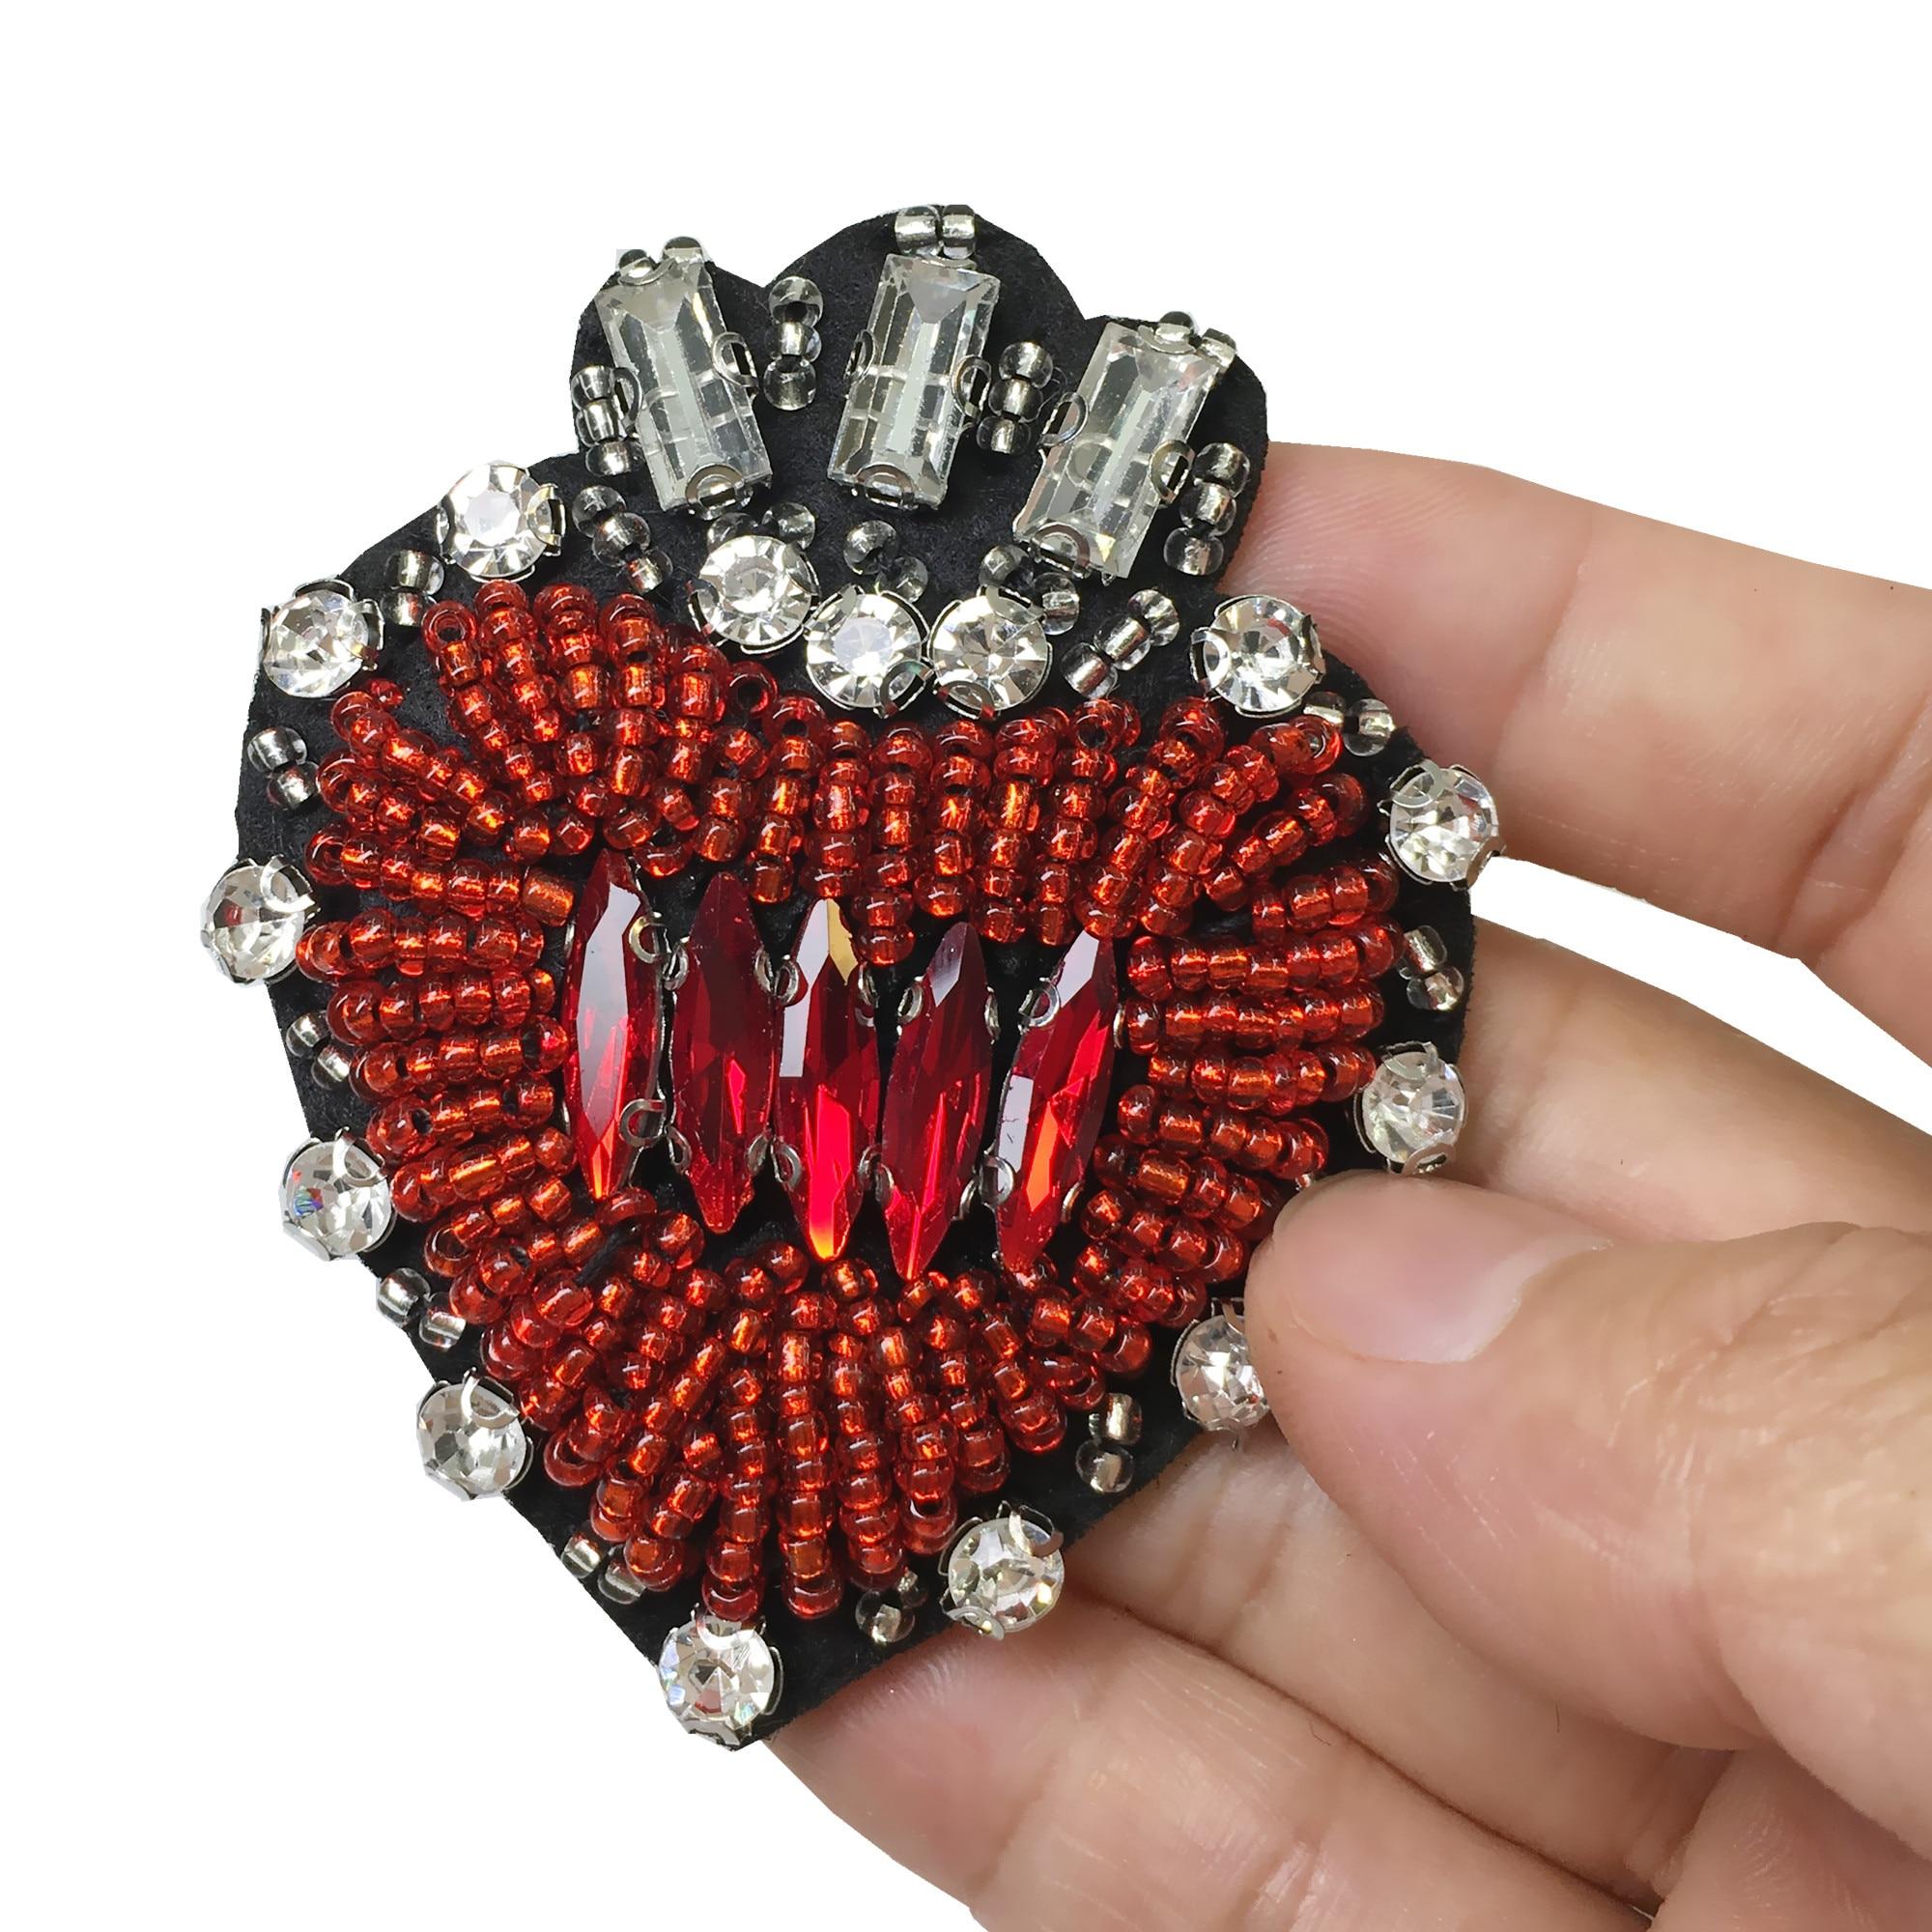 2pc 6.5x5.5cm Ραπτίζει Κόκκινο Καρδιά Patch - Τέχνες, βιοτεχνίες και ράψιμο